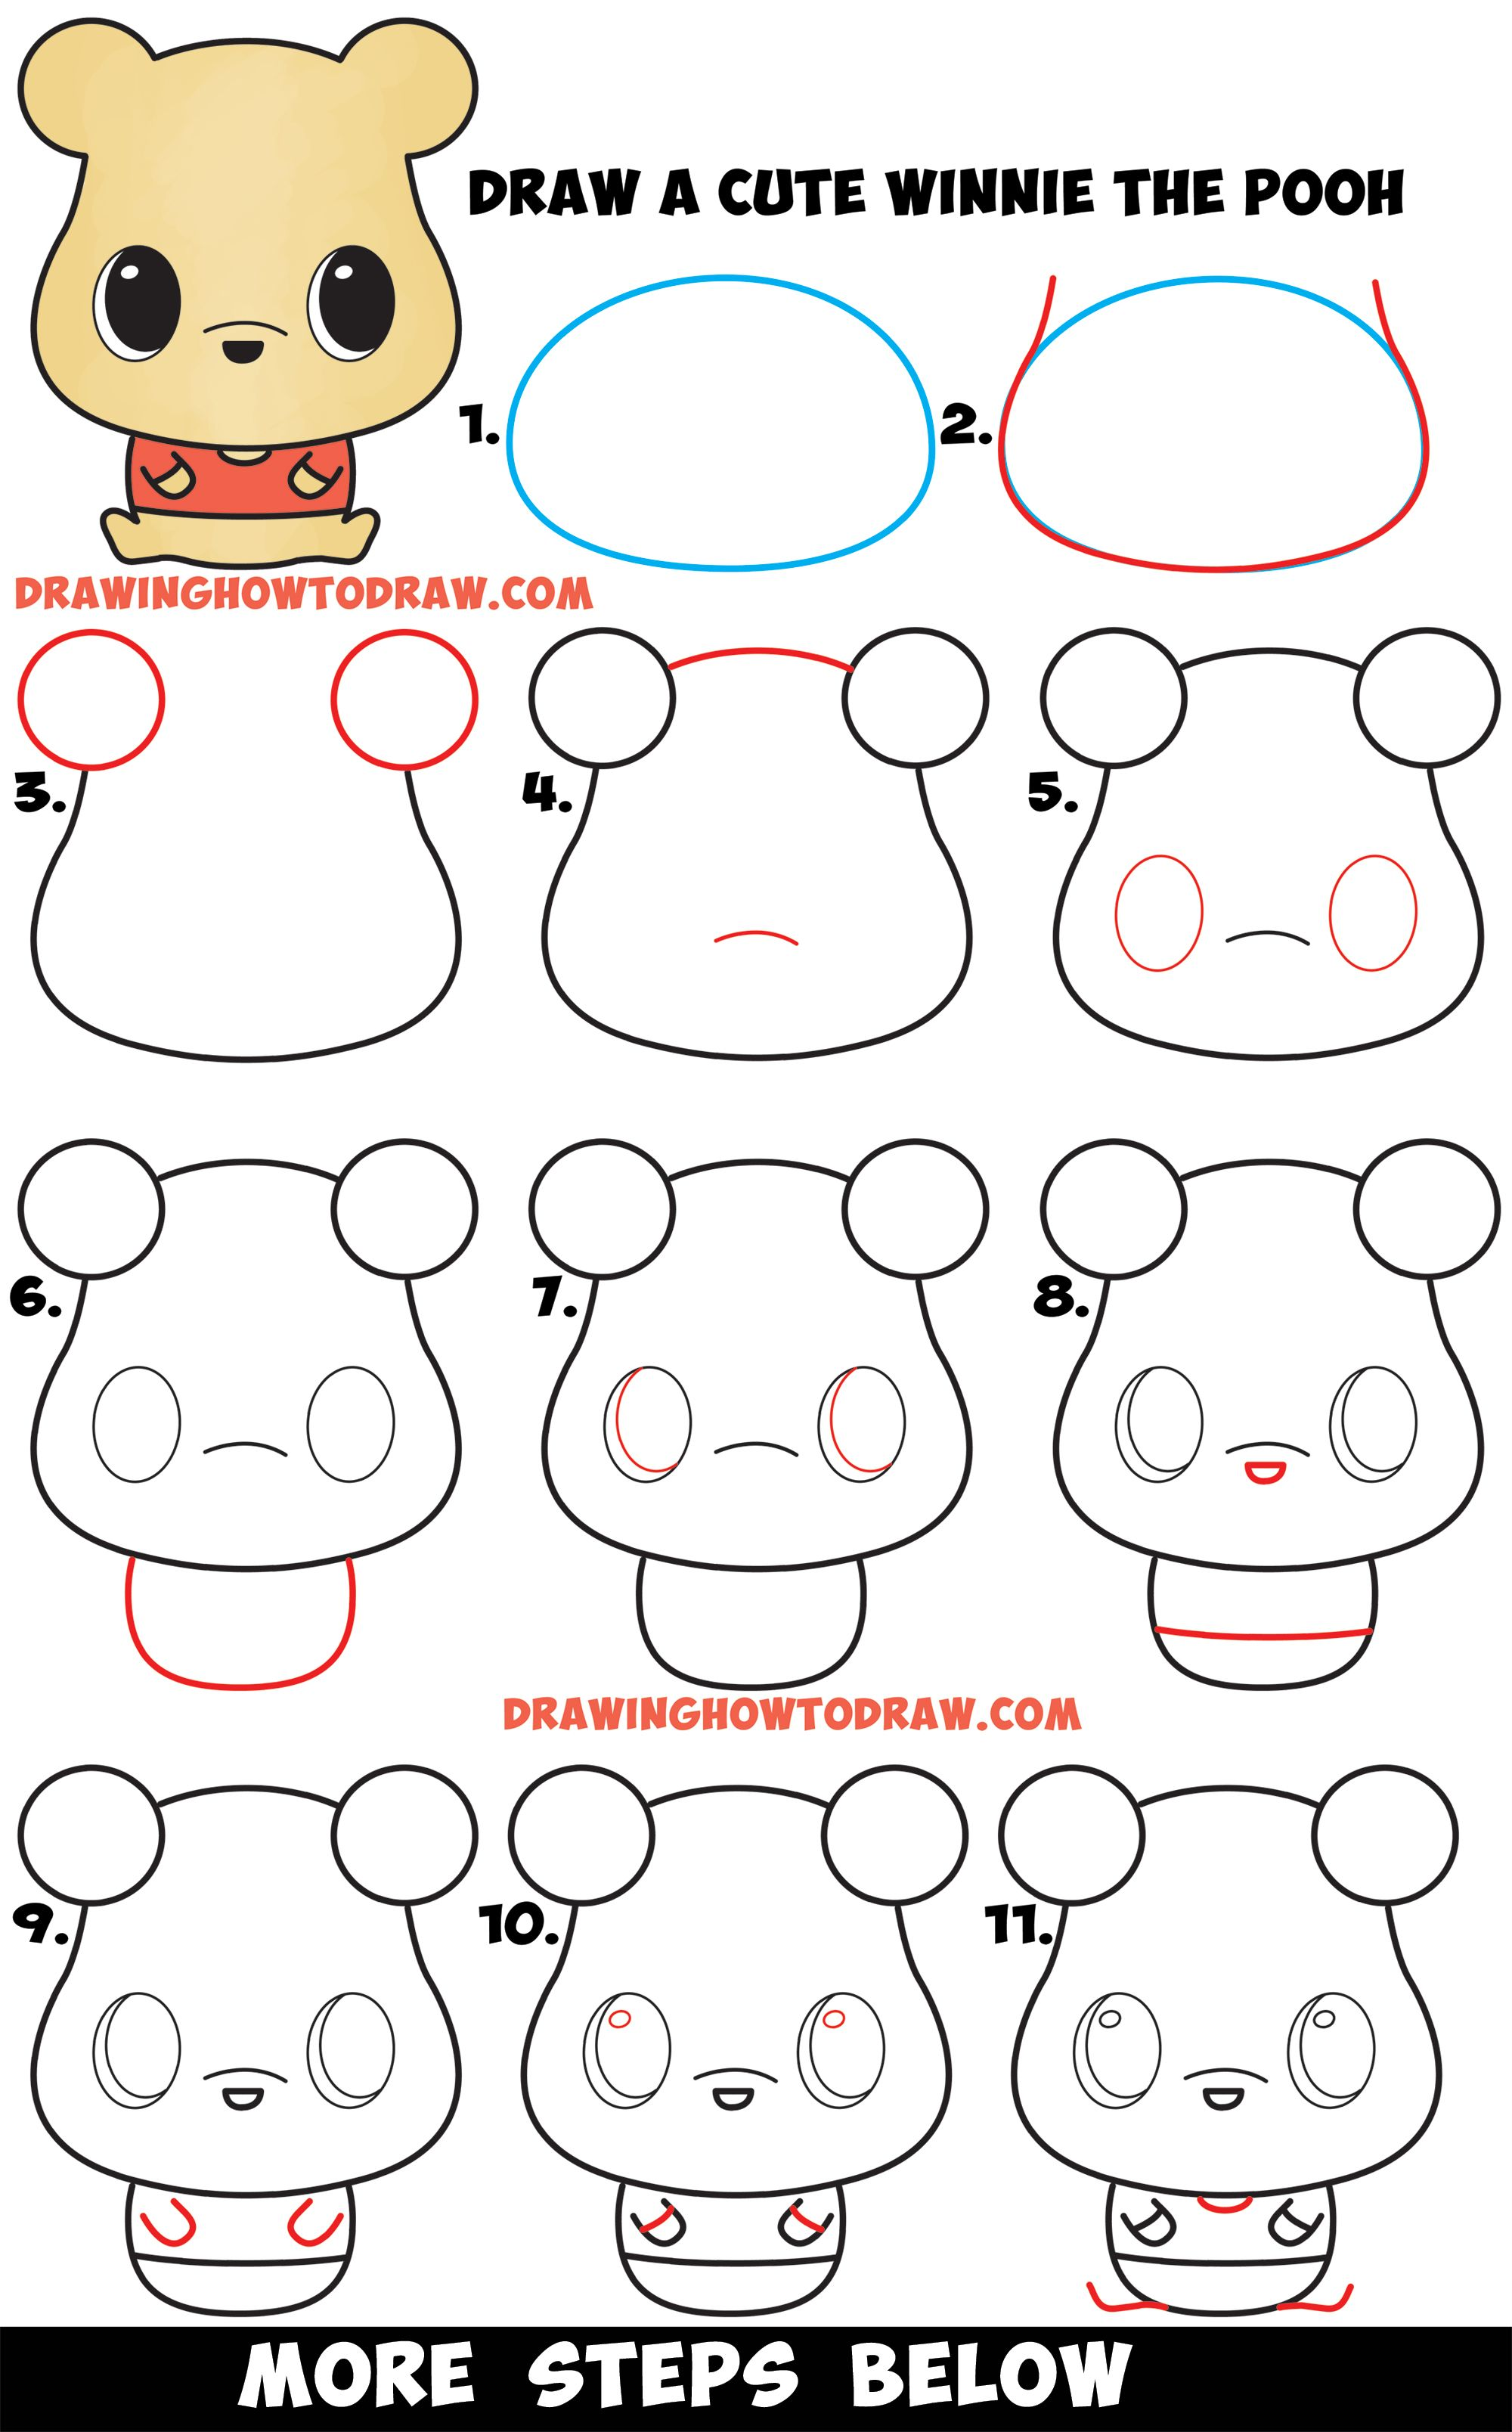 How To Draw A Cute Chibi / Kawaii Winnie The Pooh Easy